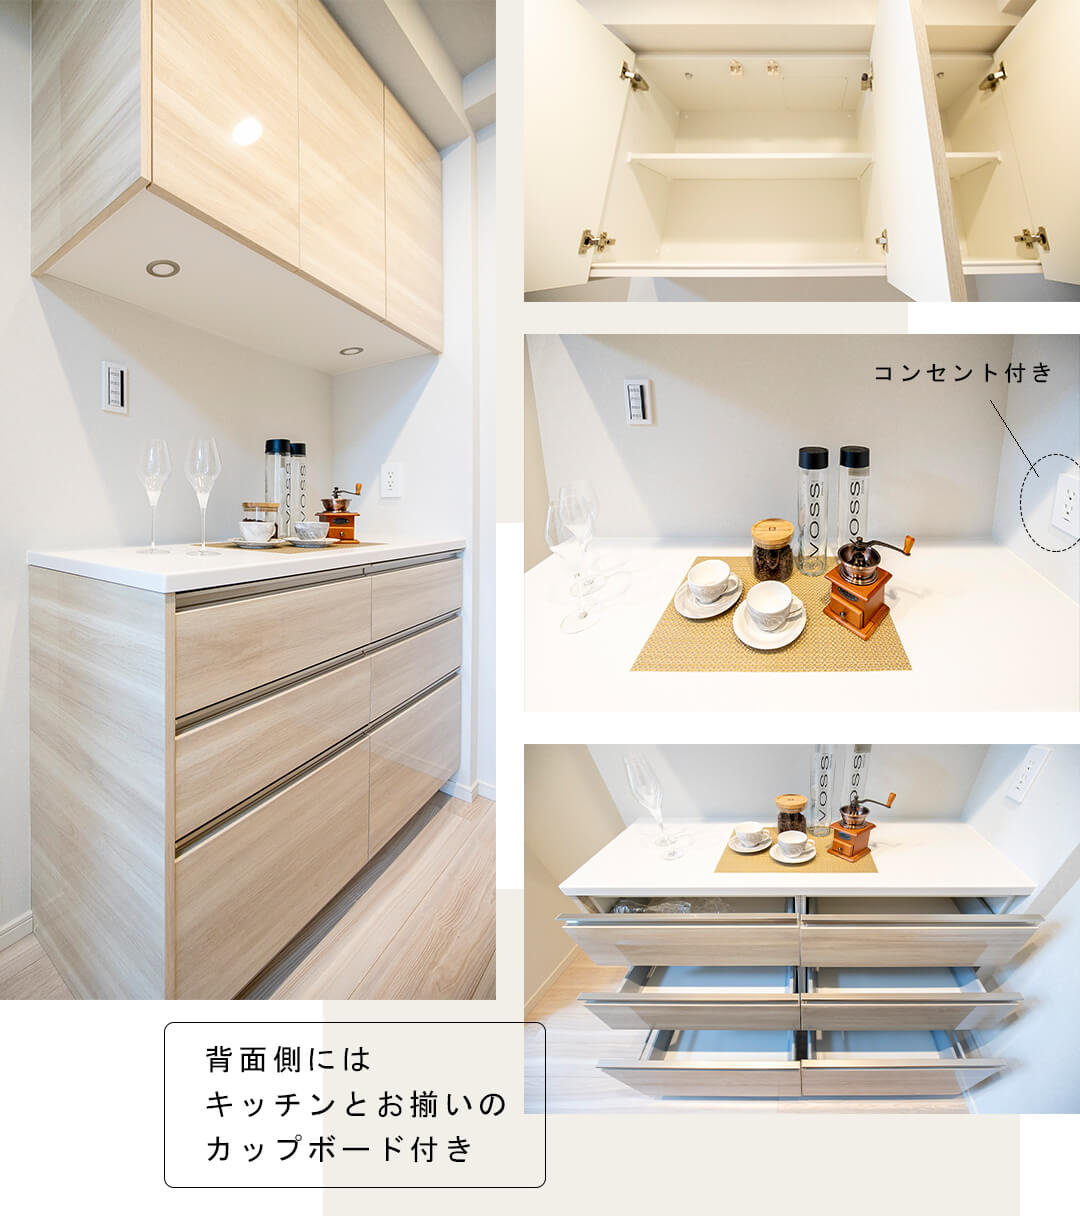 THE COURT神宮外苑のキッチン